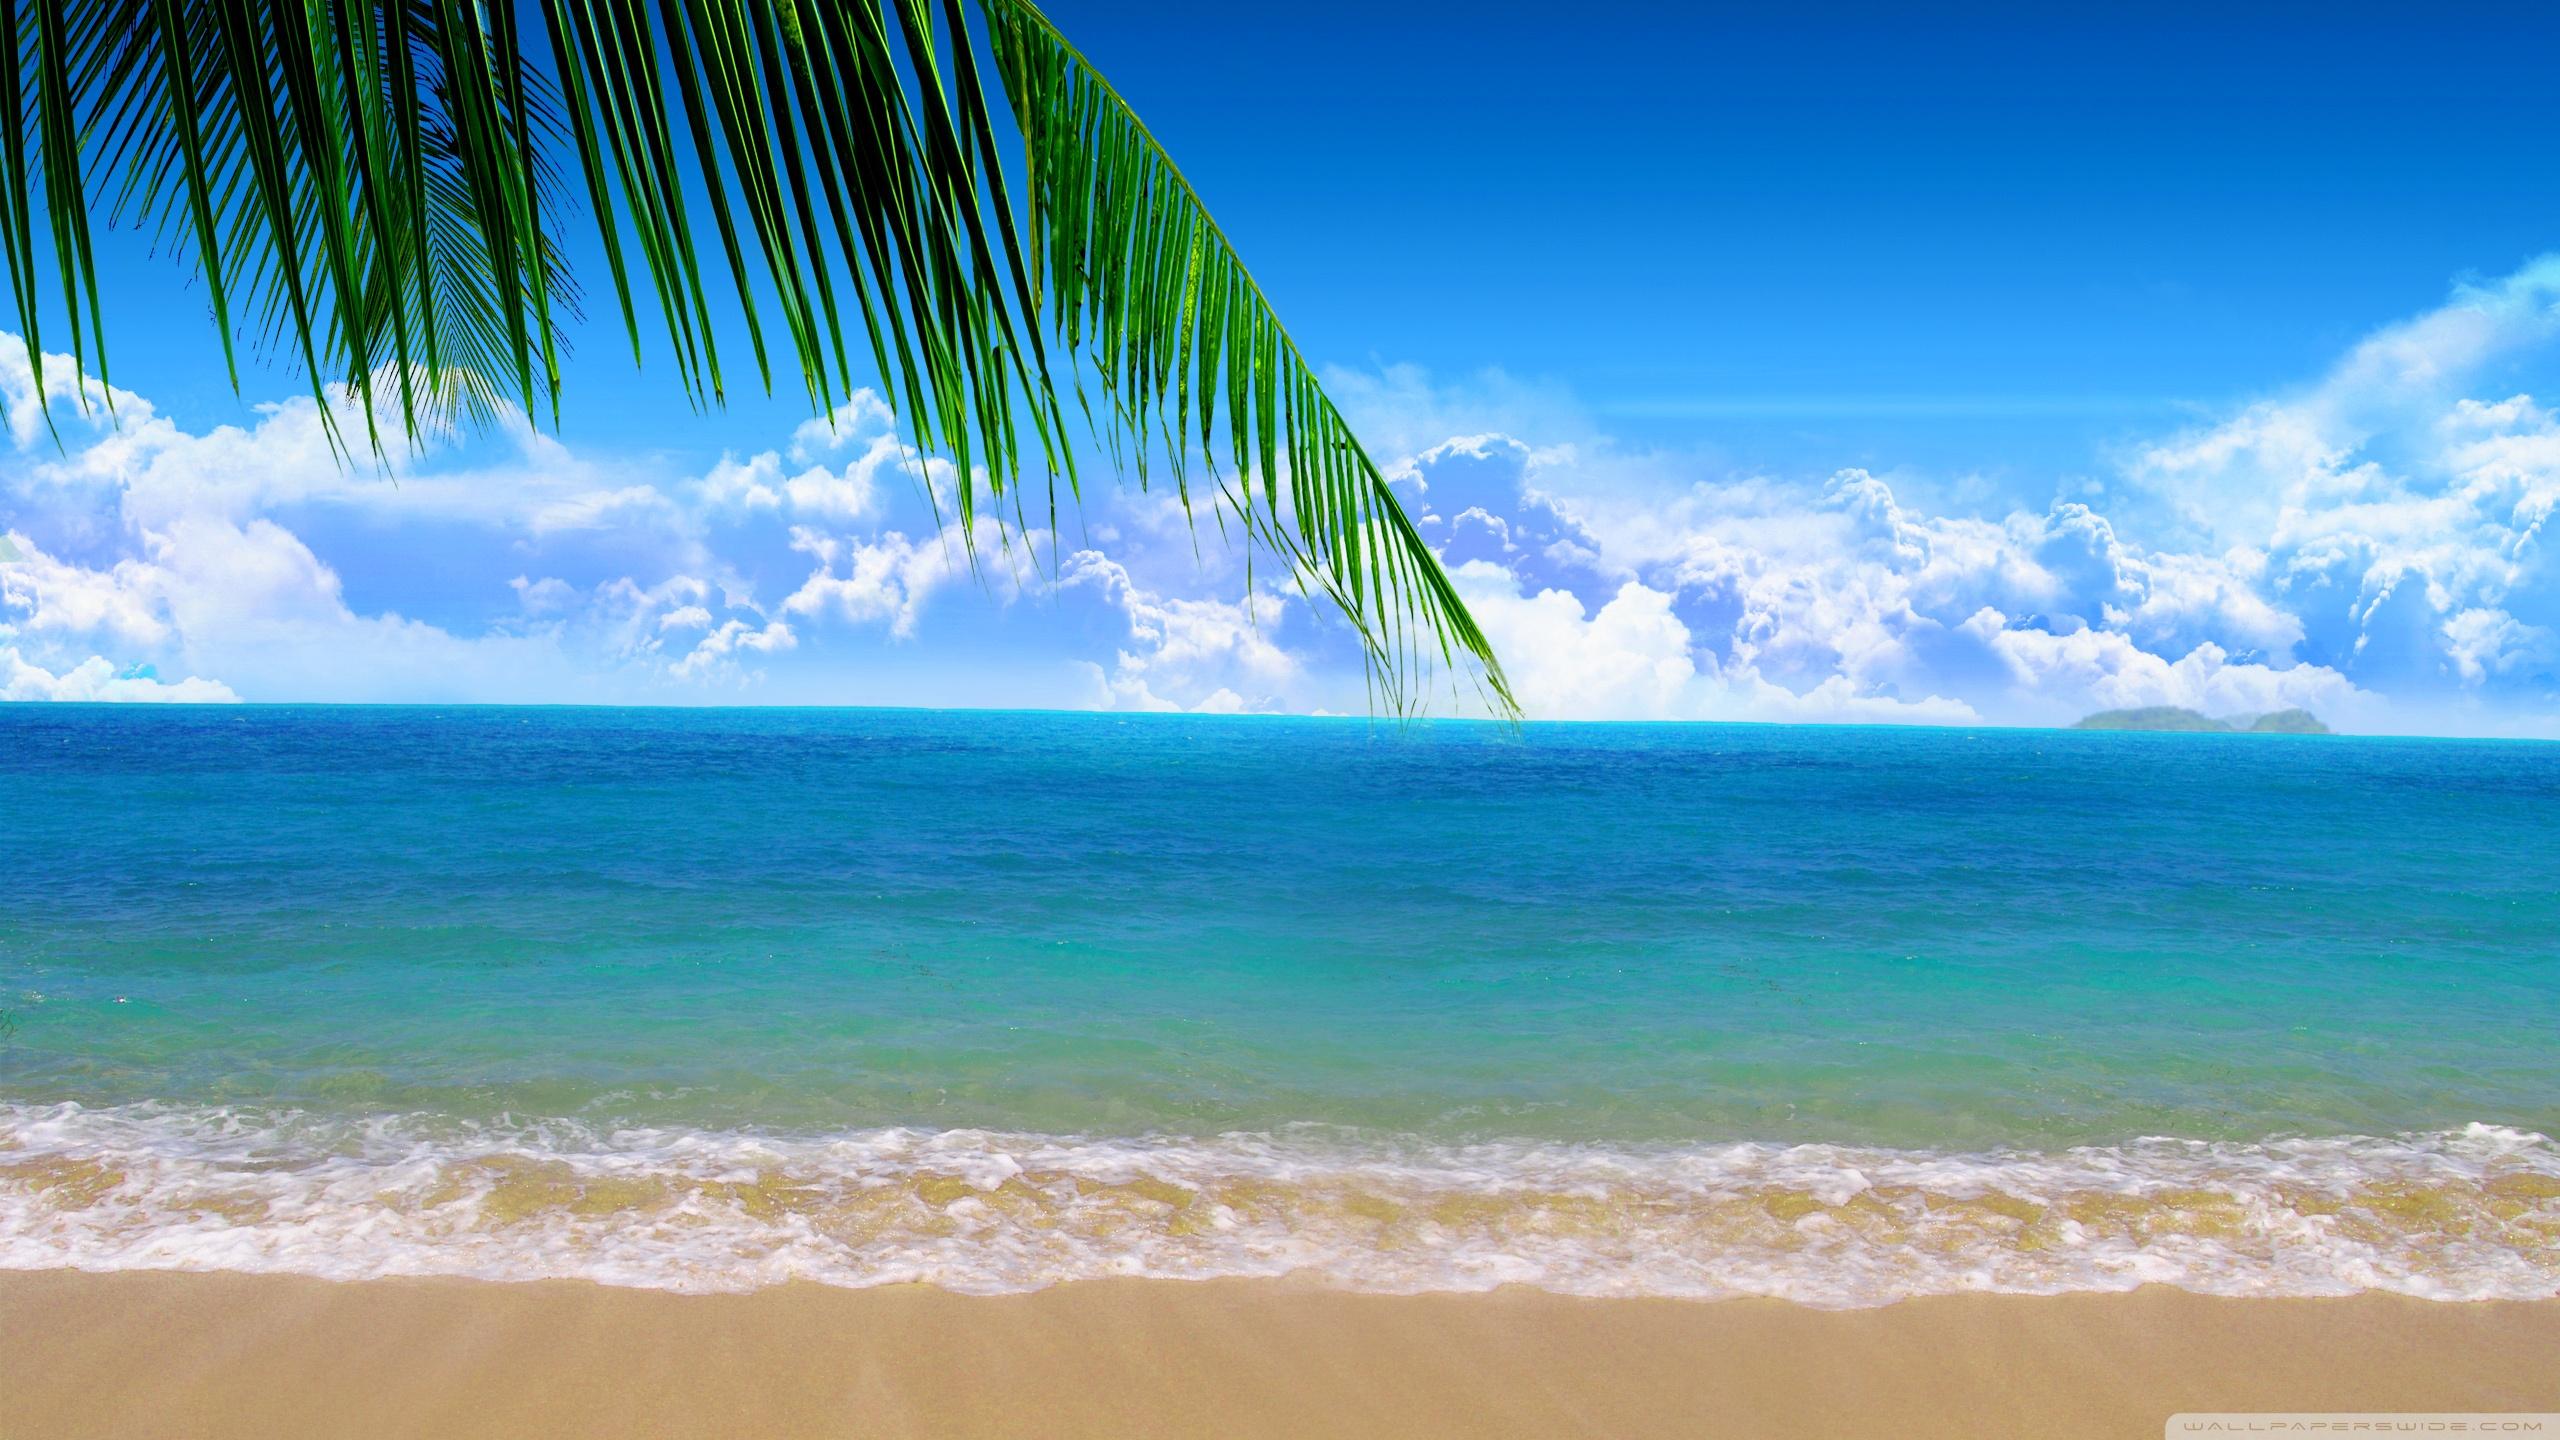 Shore Palms Tropical Beach 4k Hd Desktop Wallpaper For 4k: Image De Mer (8